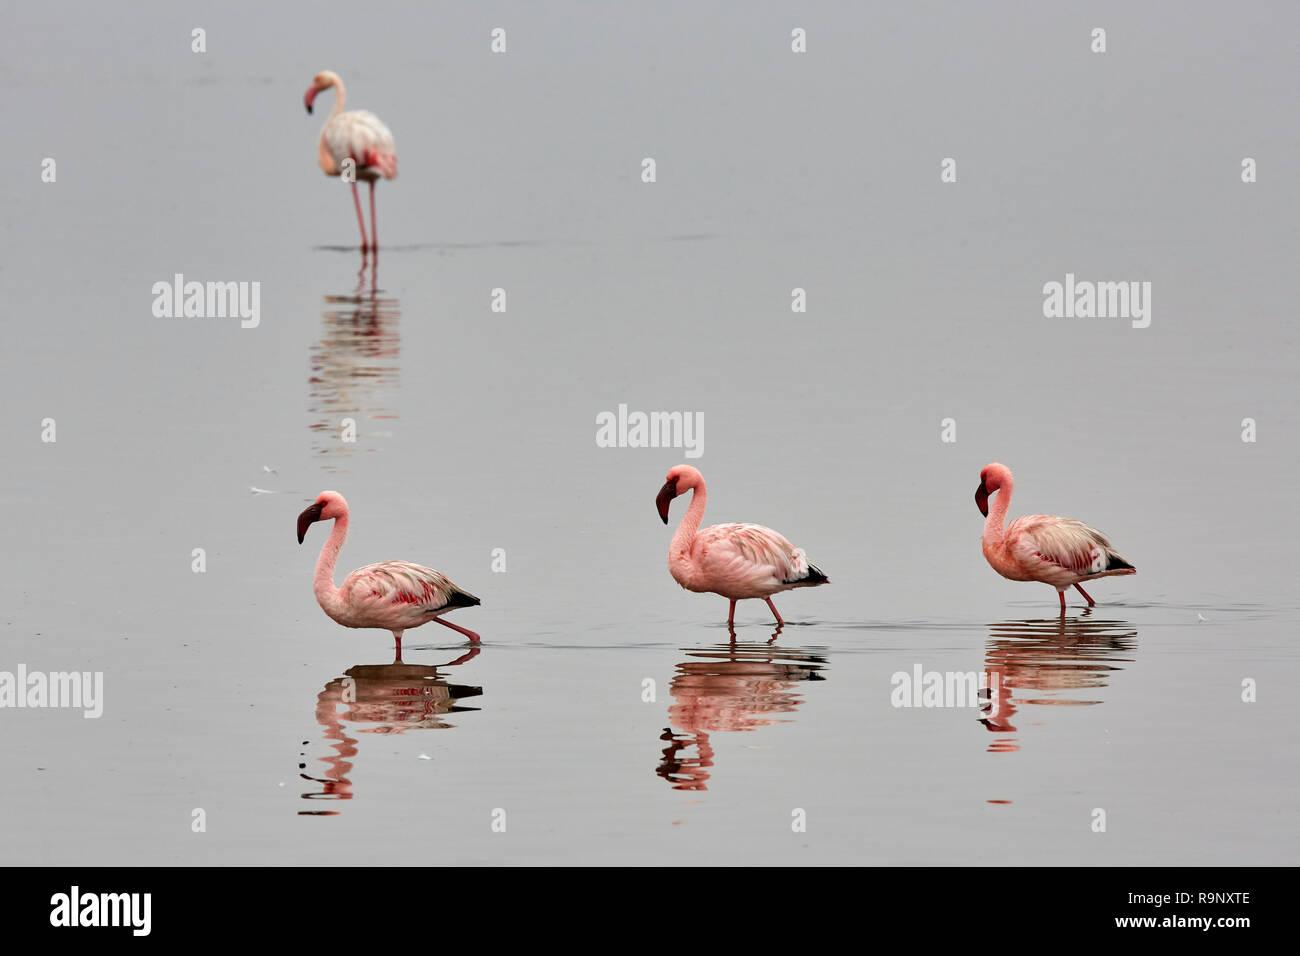 Phoenicopterus Roseus Greater Flamingo Phoeniconaias Minor Lesser Flamingo in Walvis Bay, Namibia Africa Stock Photo